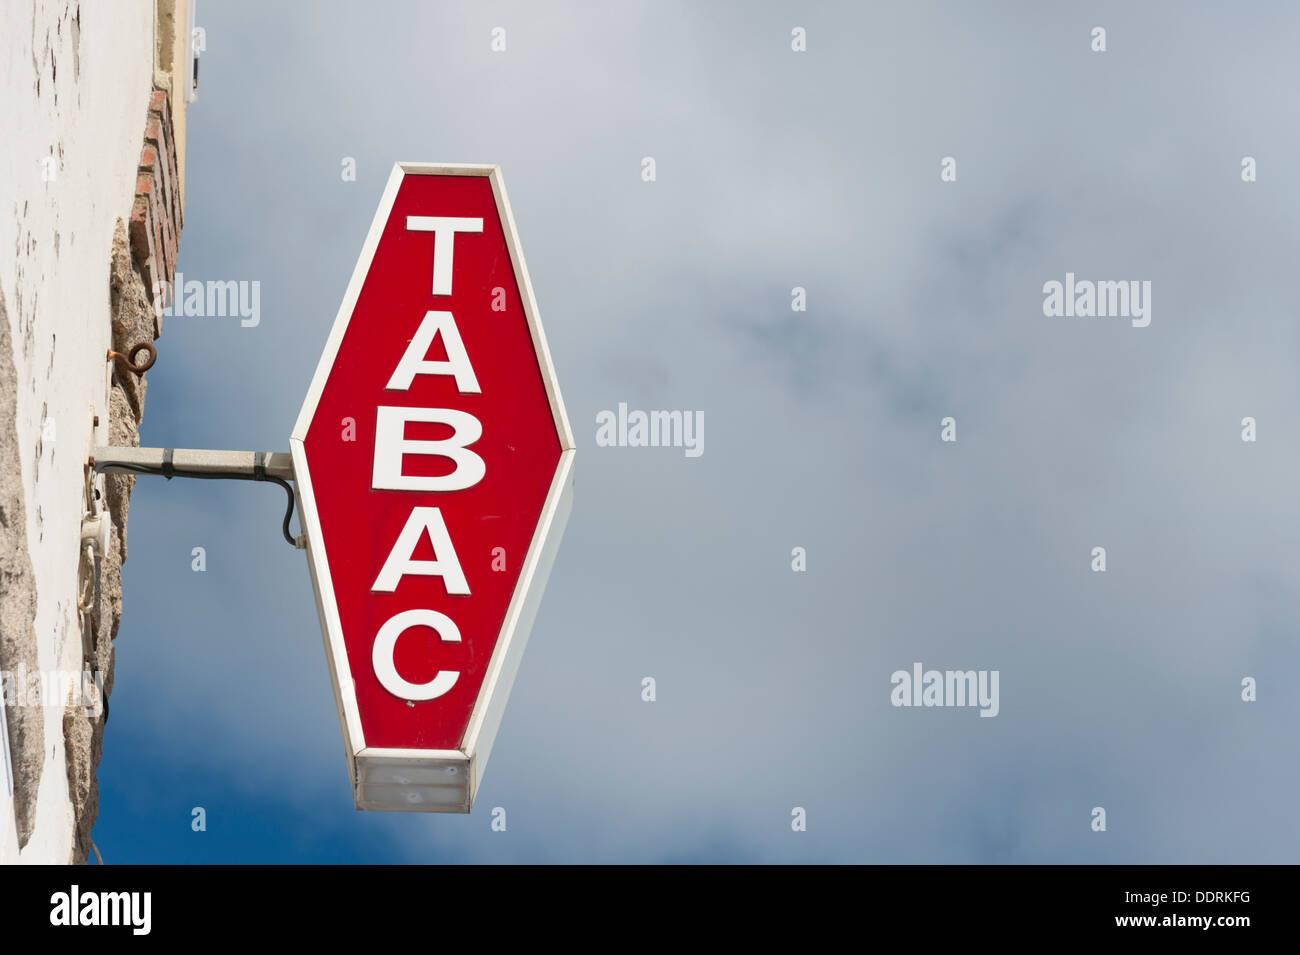 Unique Tobacconist Shop Stock Photos & Tobacconist Shop Stock Images - Alamy RV39